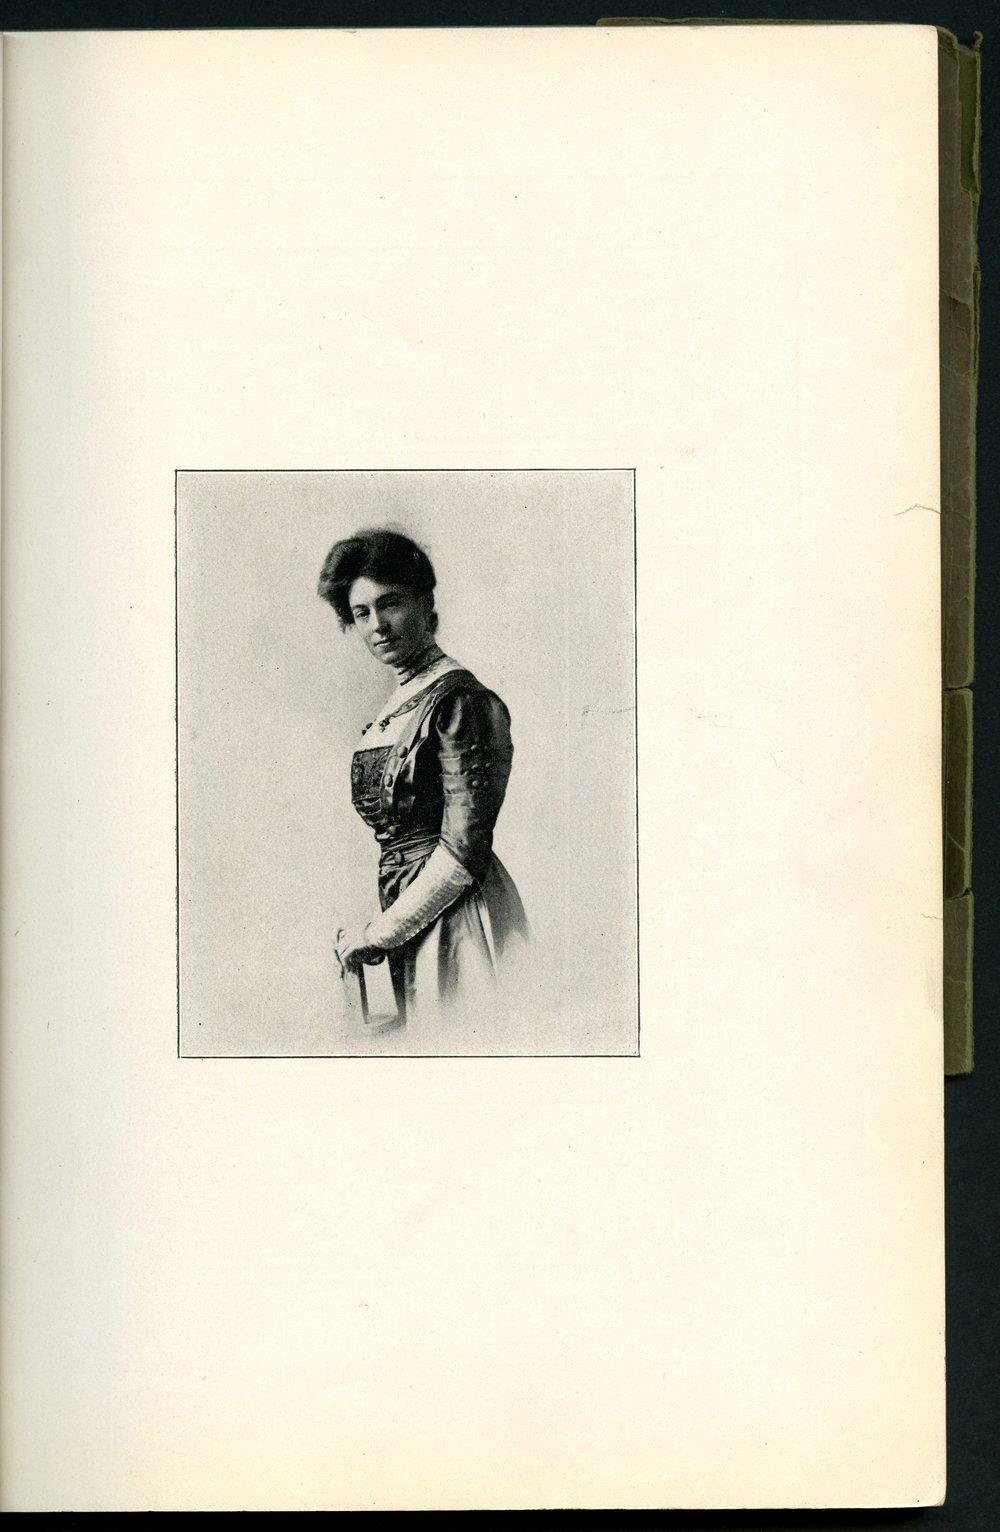 Mount Marty yearbook, 1910, Rosedale, Kansas - 5